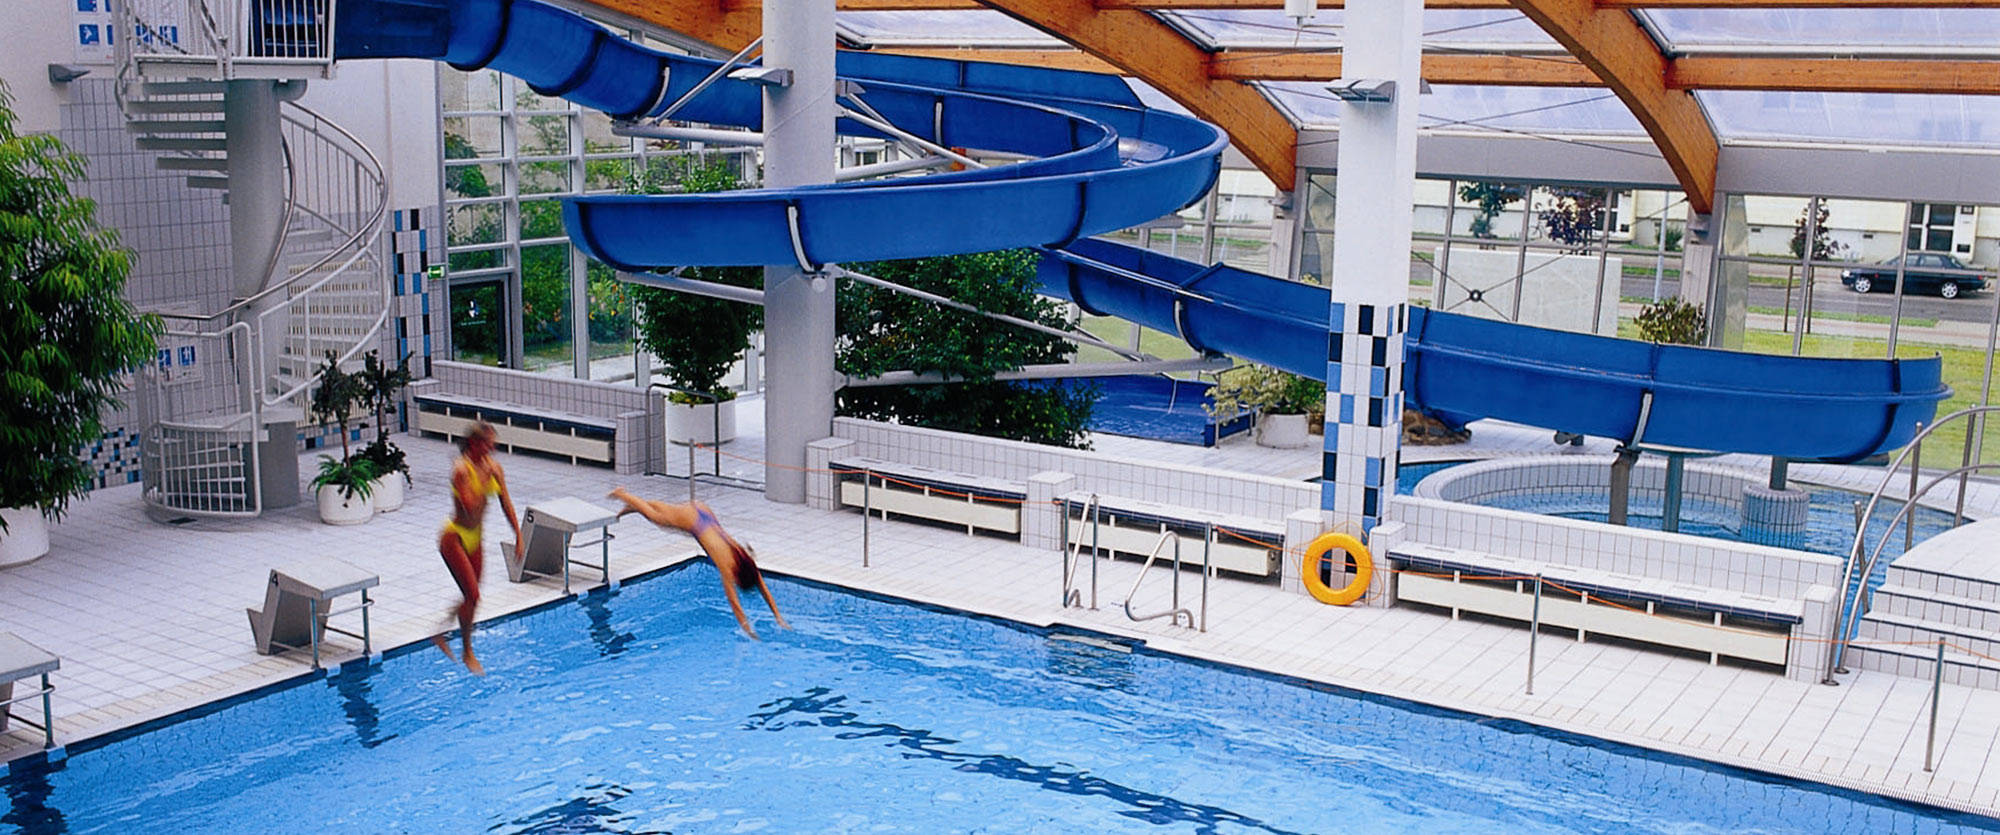 Wittenberge Schwimmbad